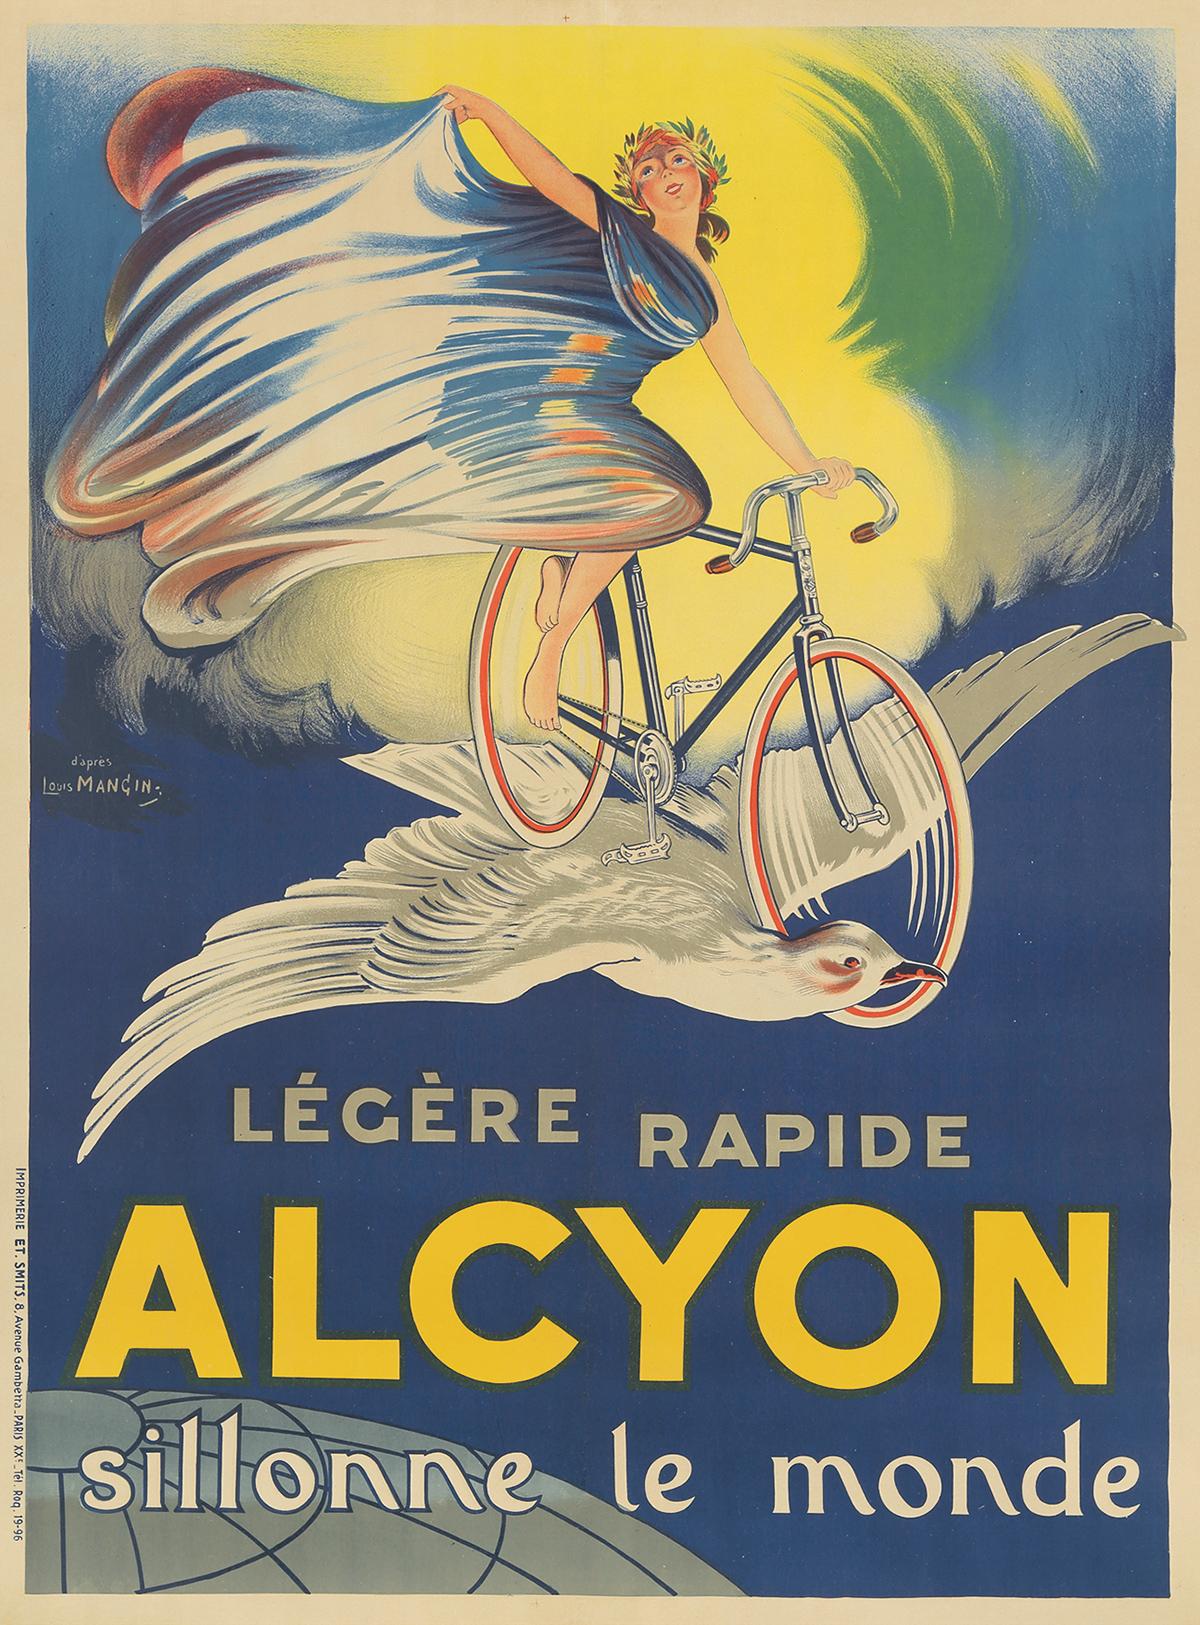 Legere Rapide Alcyon Bicycle Paris France French Advertisement Art Poster Print